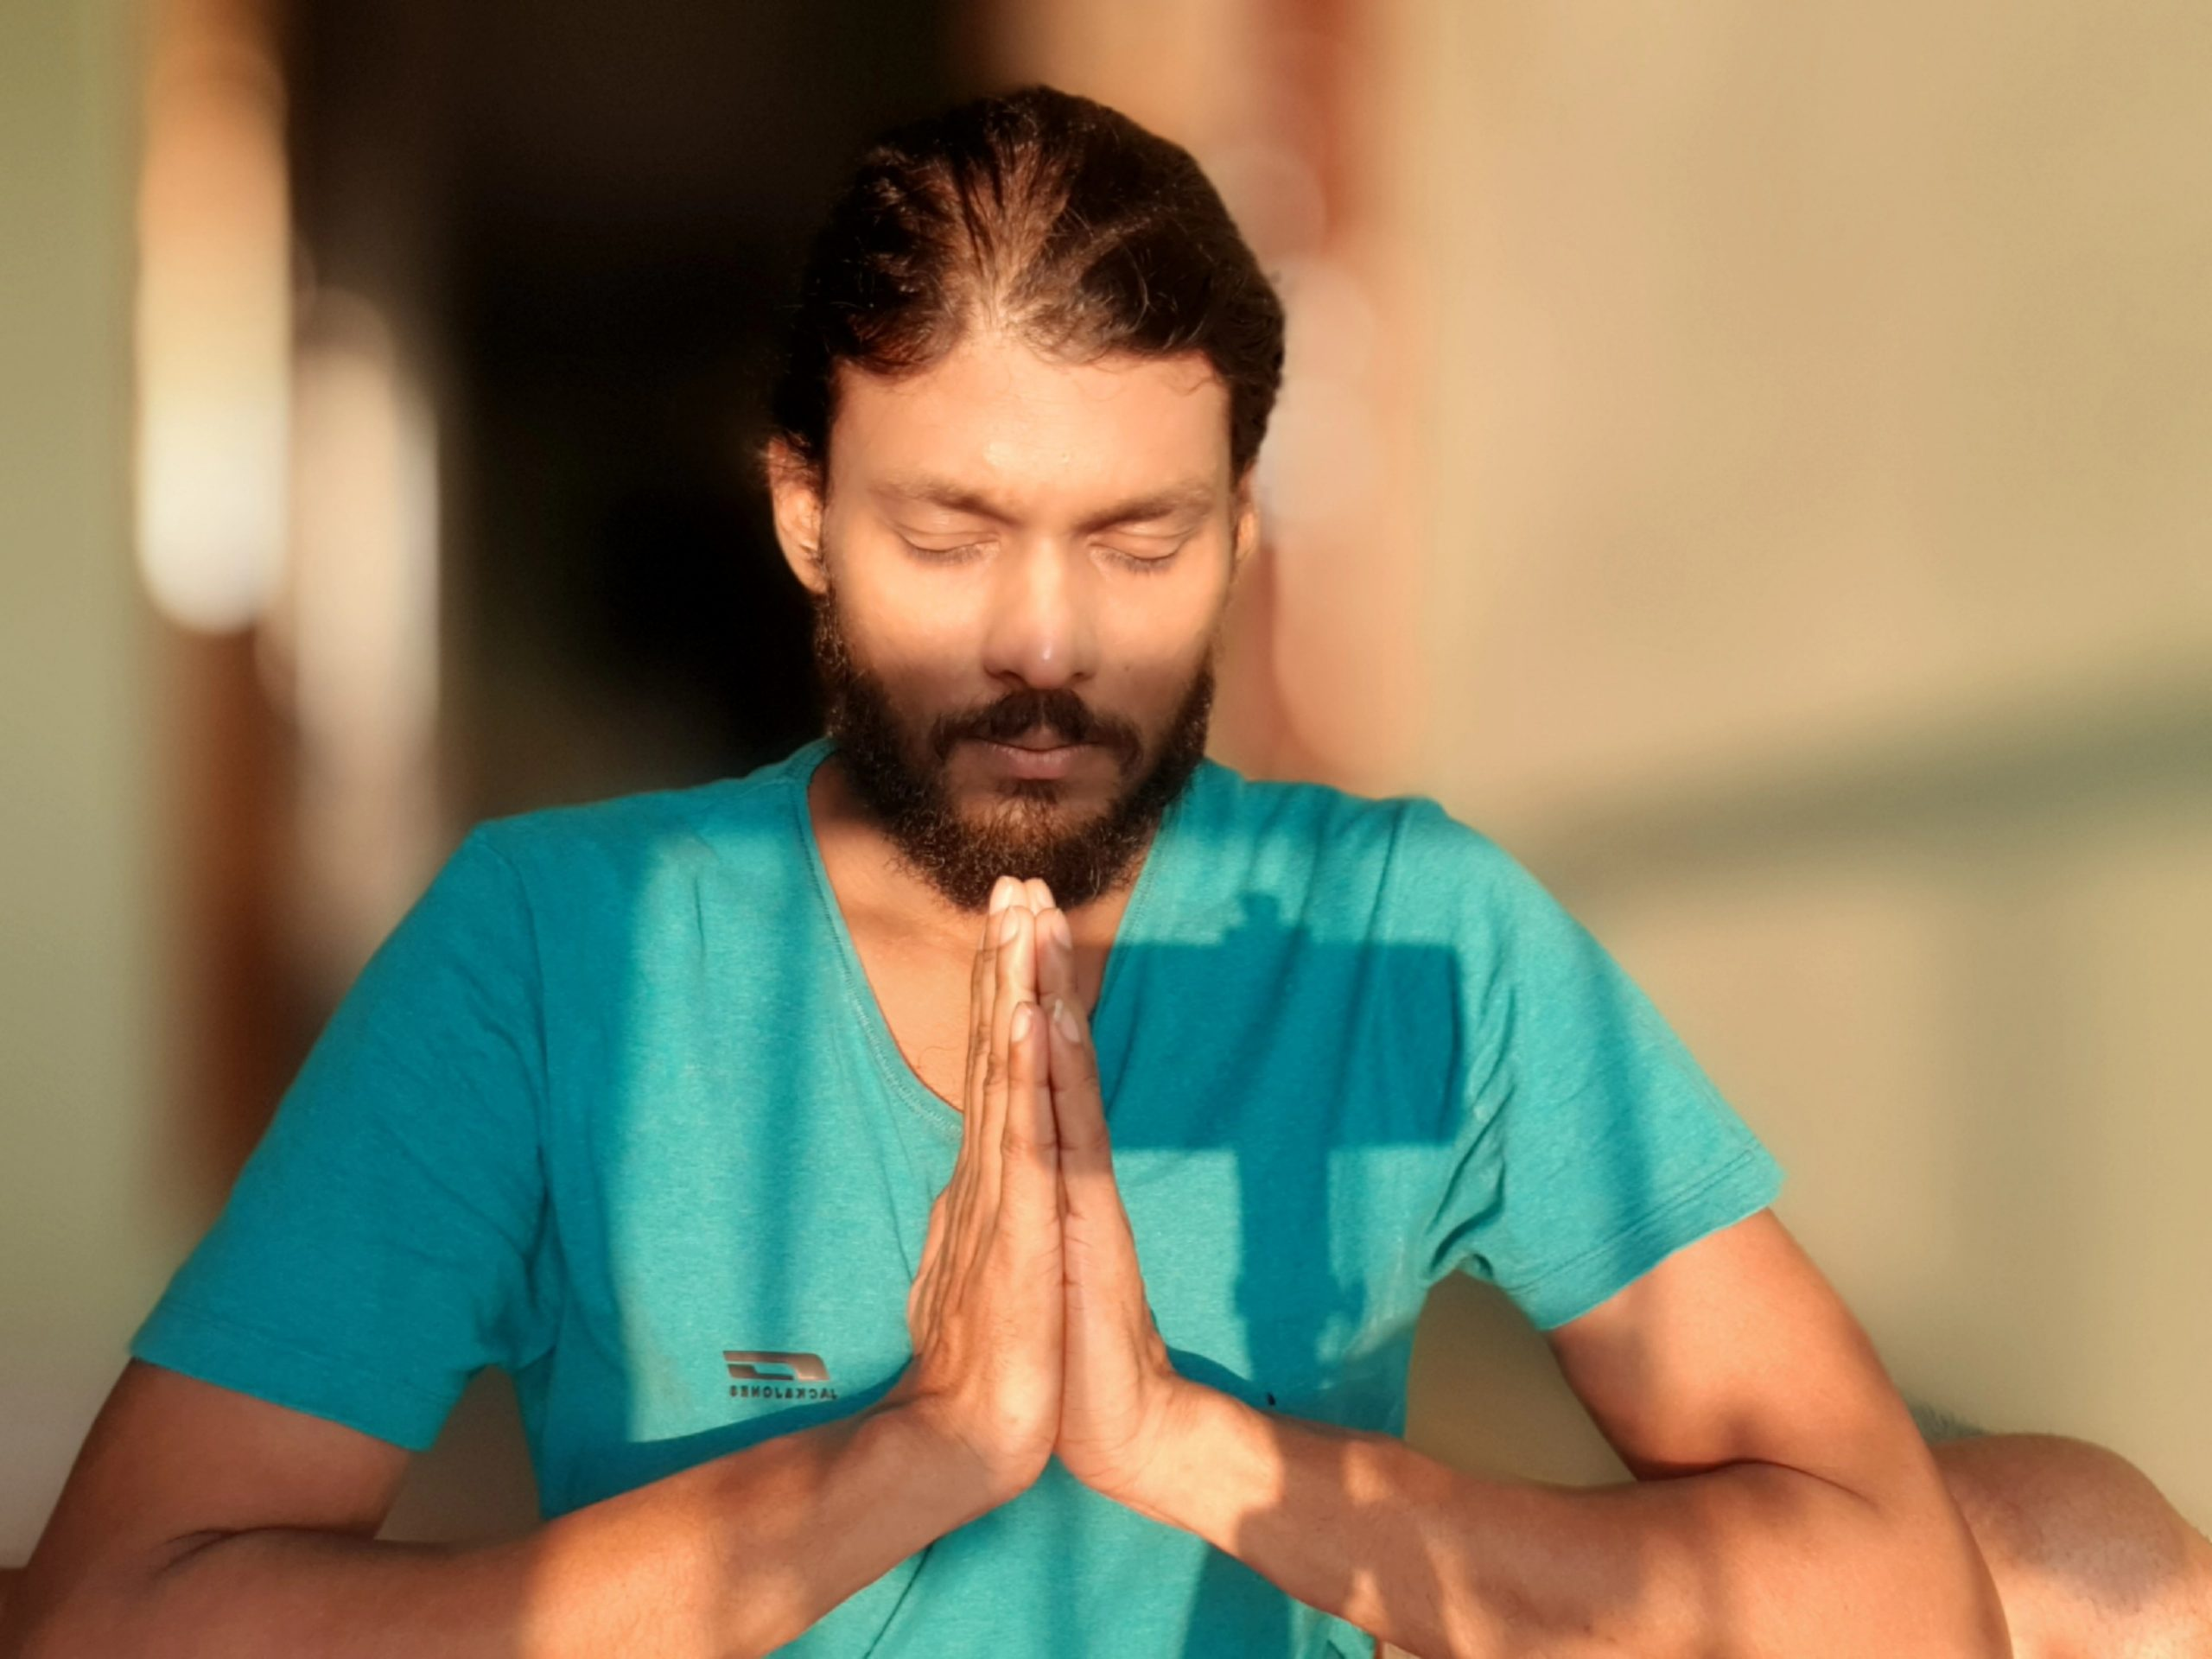 Personalized Yoga Course photo №0